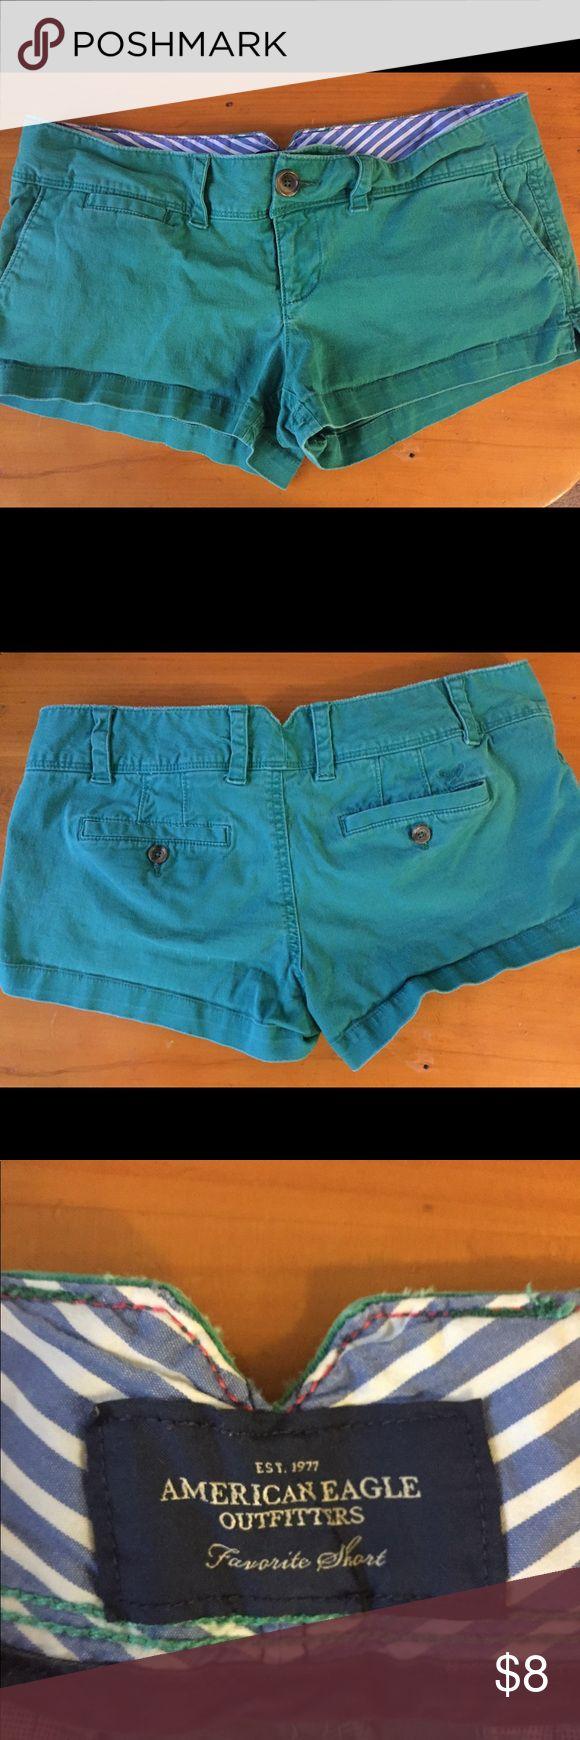 "American Eagle teal shorts AE ""favorite short"" shorts. Teal. Perfect for spring! American Eagle Outfitters Shorts"